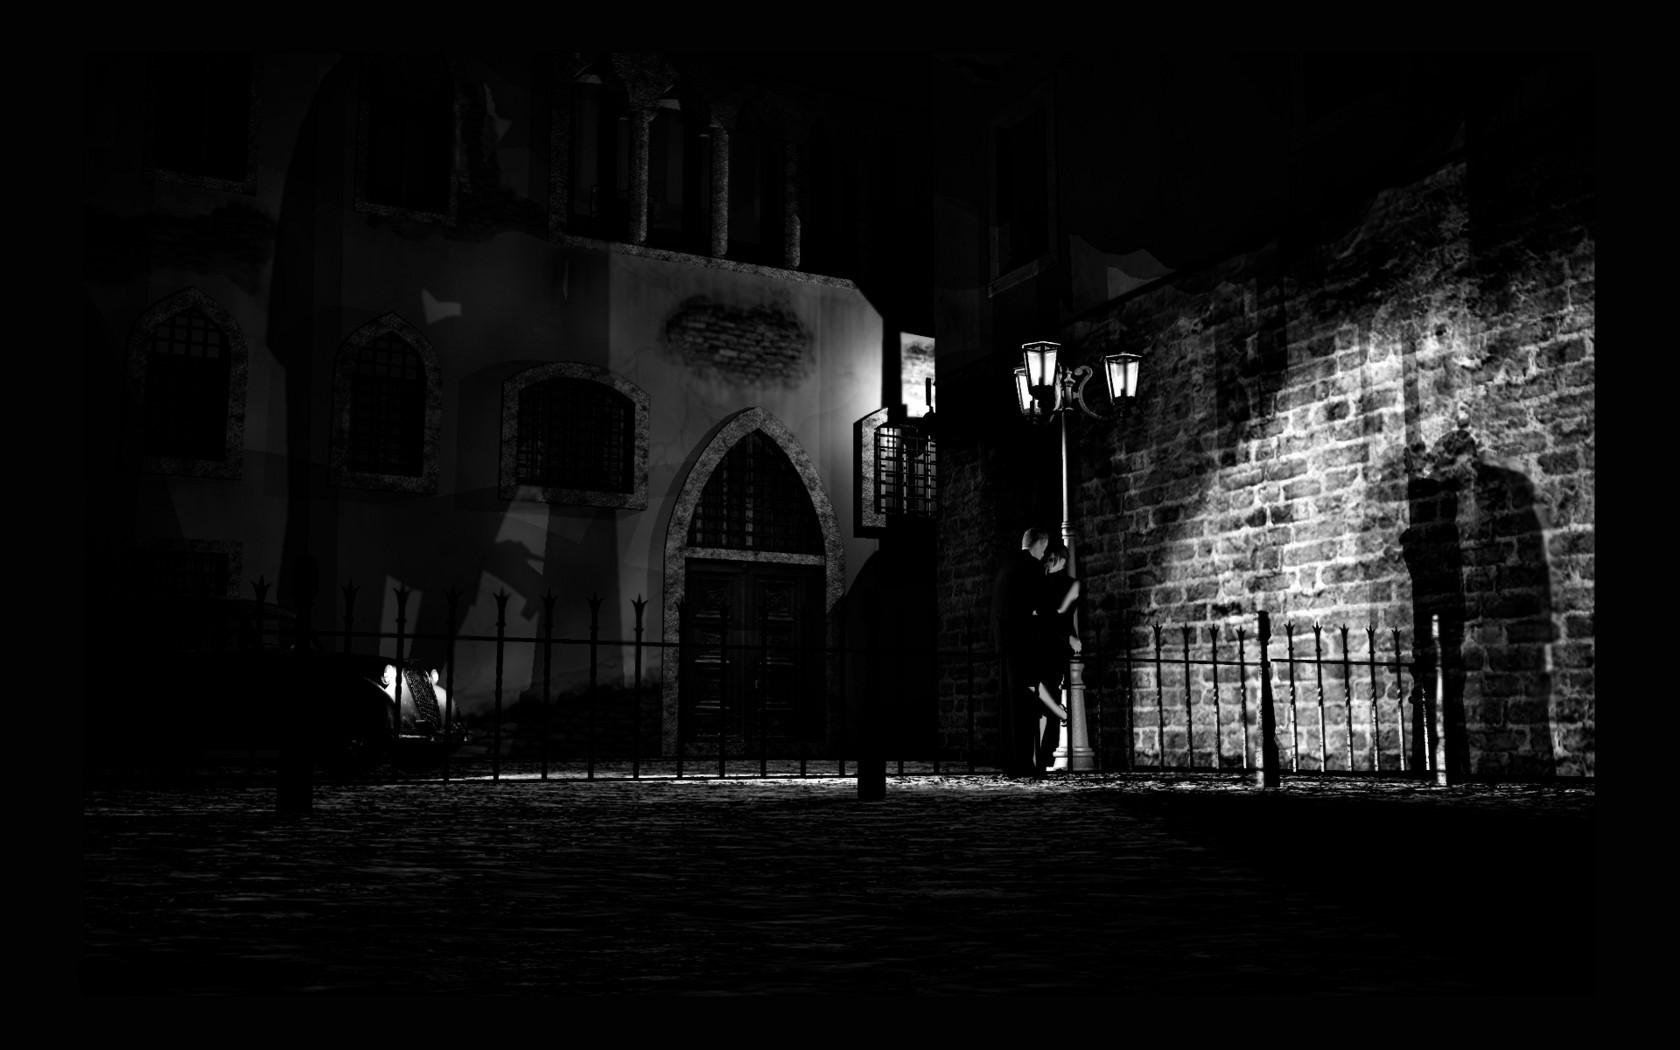 78 Film Noir Wallpaper On Wallpapersafari